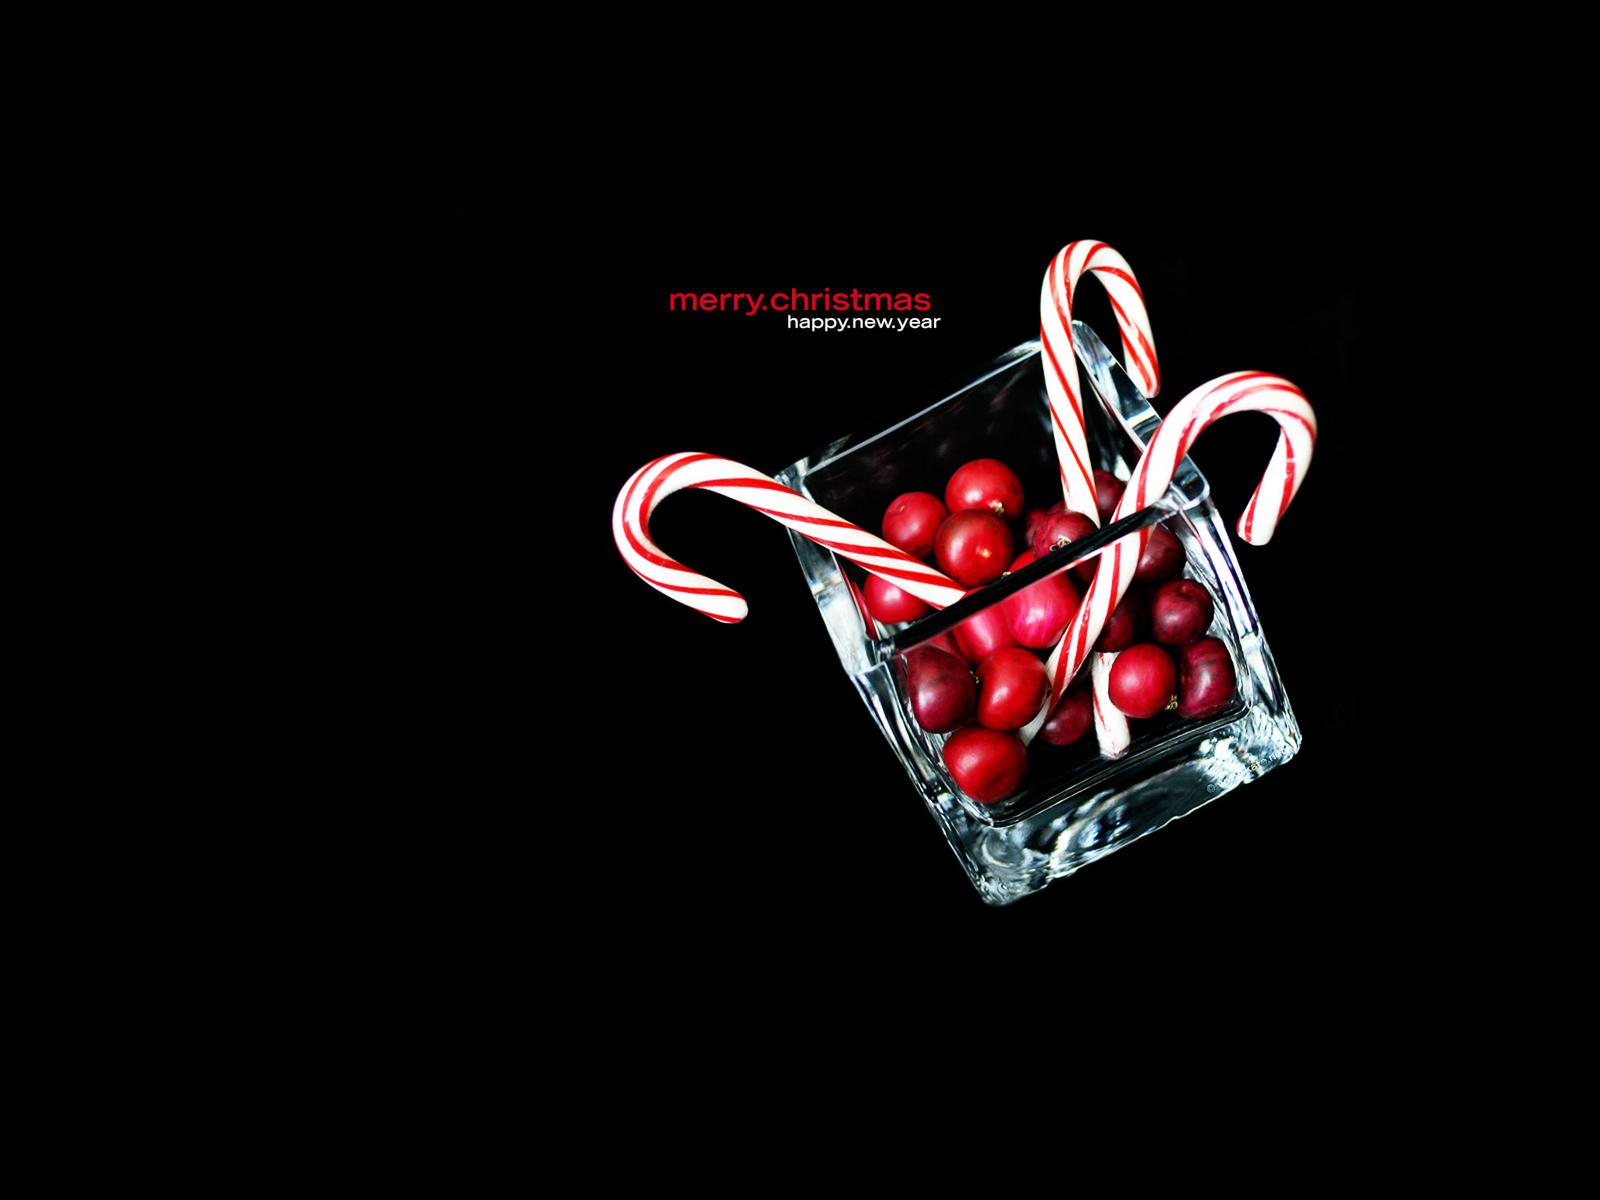 http://2.bp.blogspot.com/-J1QtaE2s9j4/T7kAHzoWJ0I/AAAAAAAAALQ/C5YALSAGVuE/s1600/Christmas+Candy+Cane+Wallpapers%5BHD%5D+%288%29.jpg